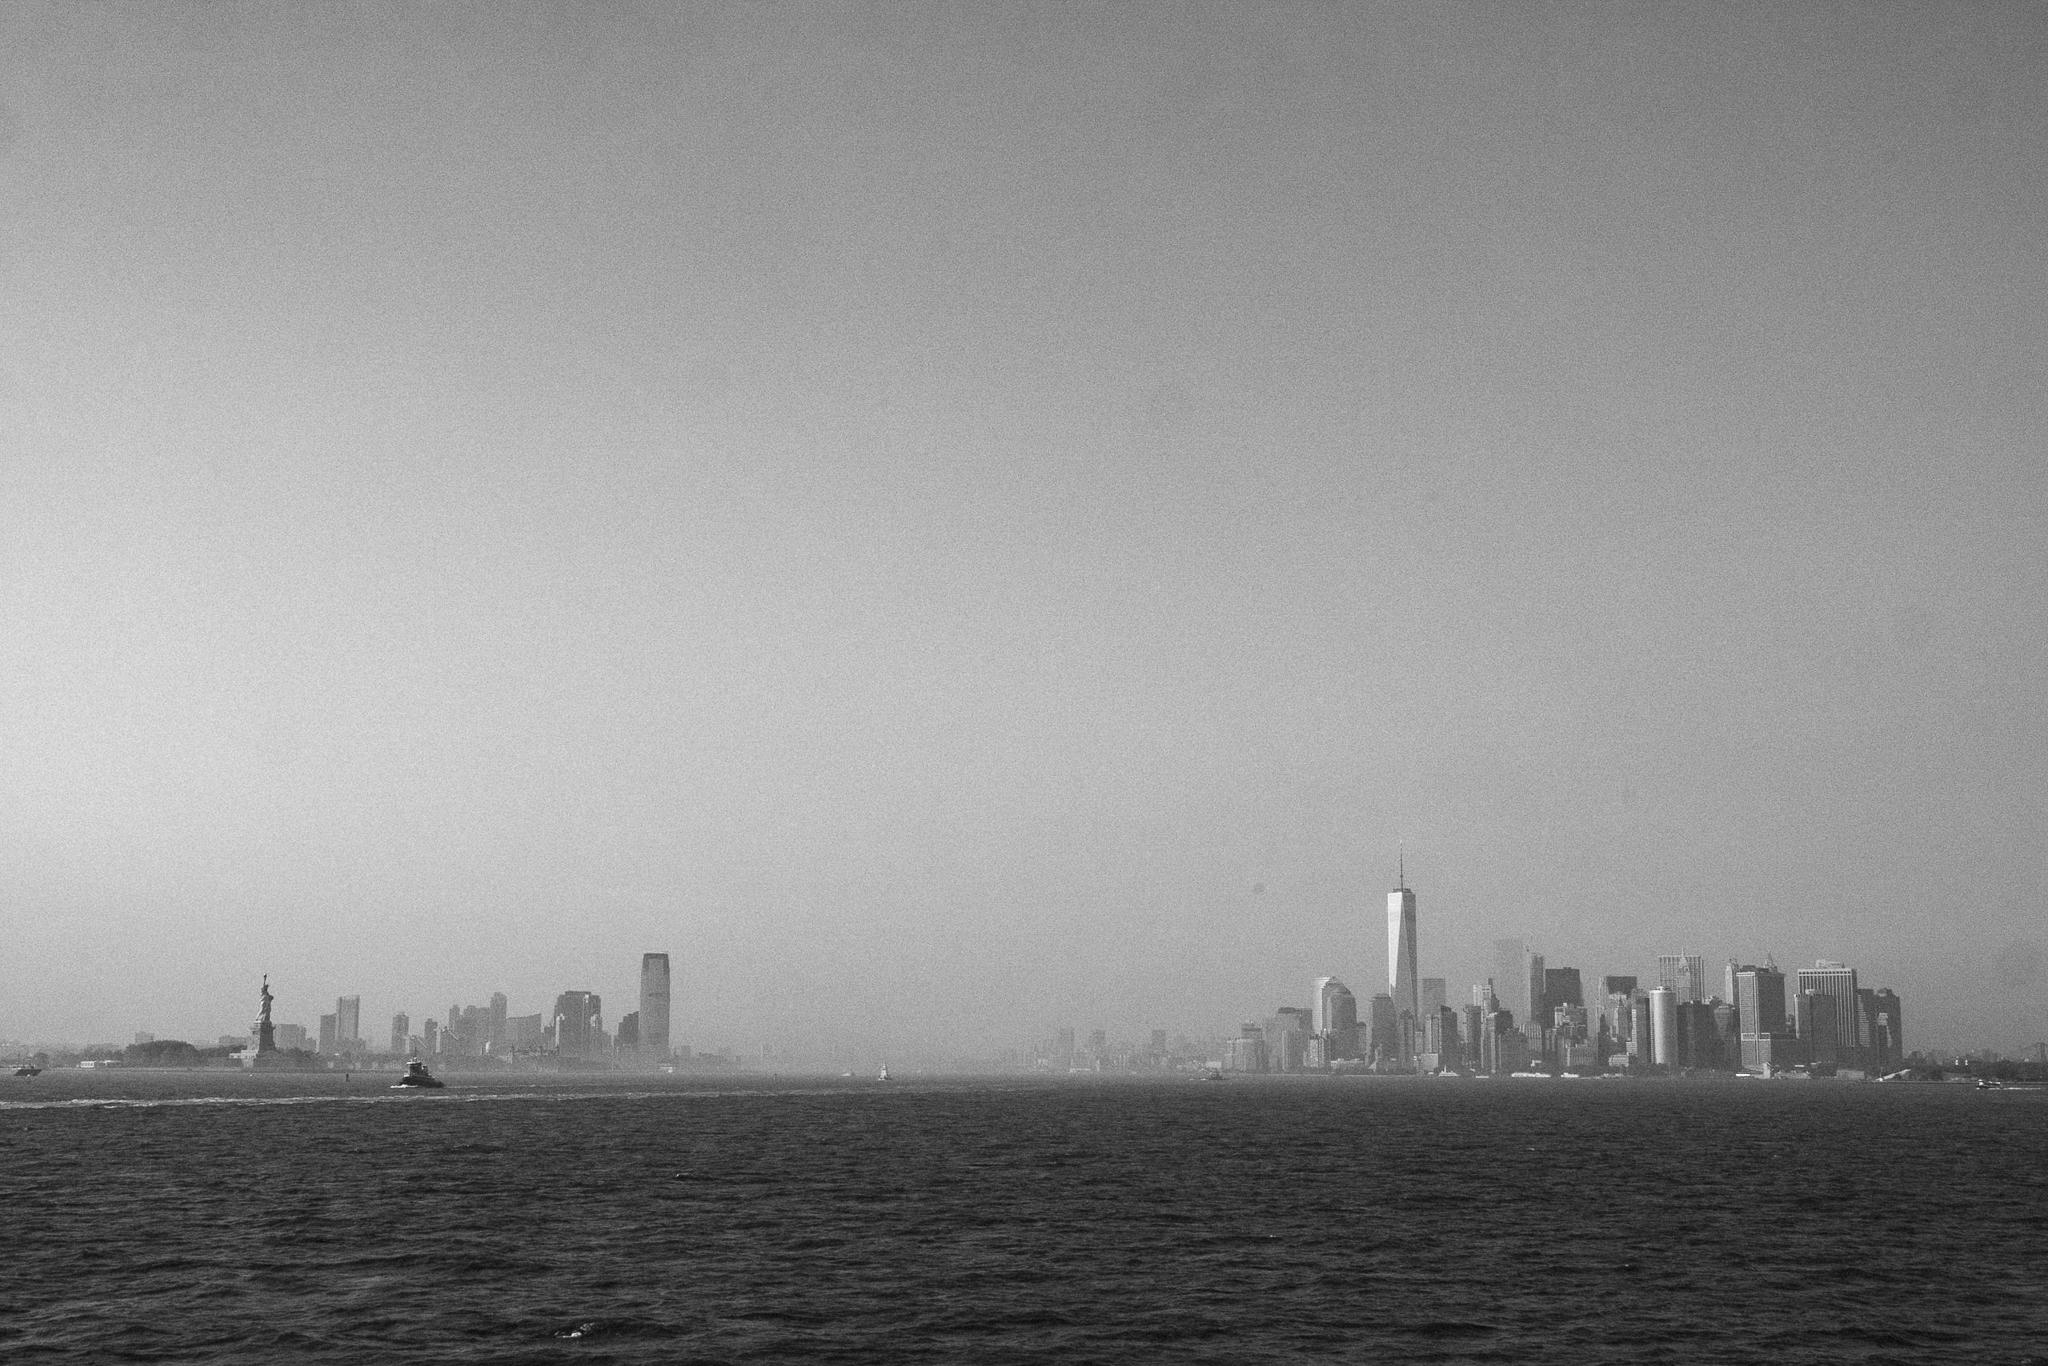 2015-05-14-NYC-1999.jpg